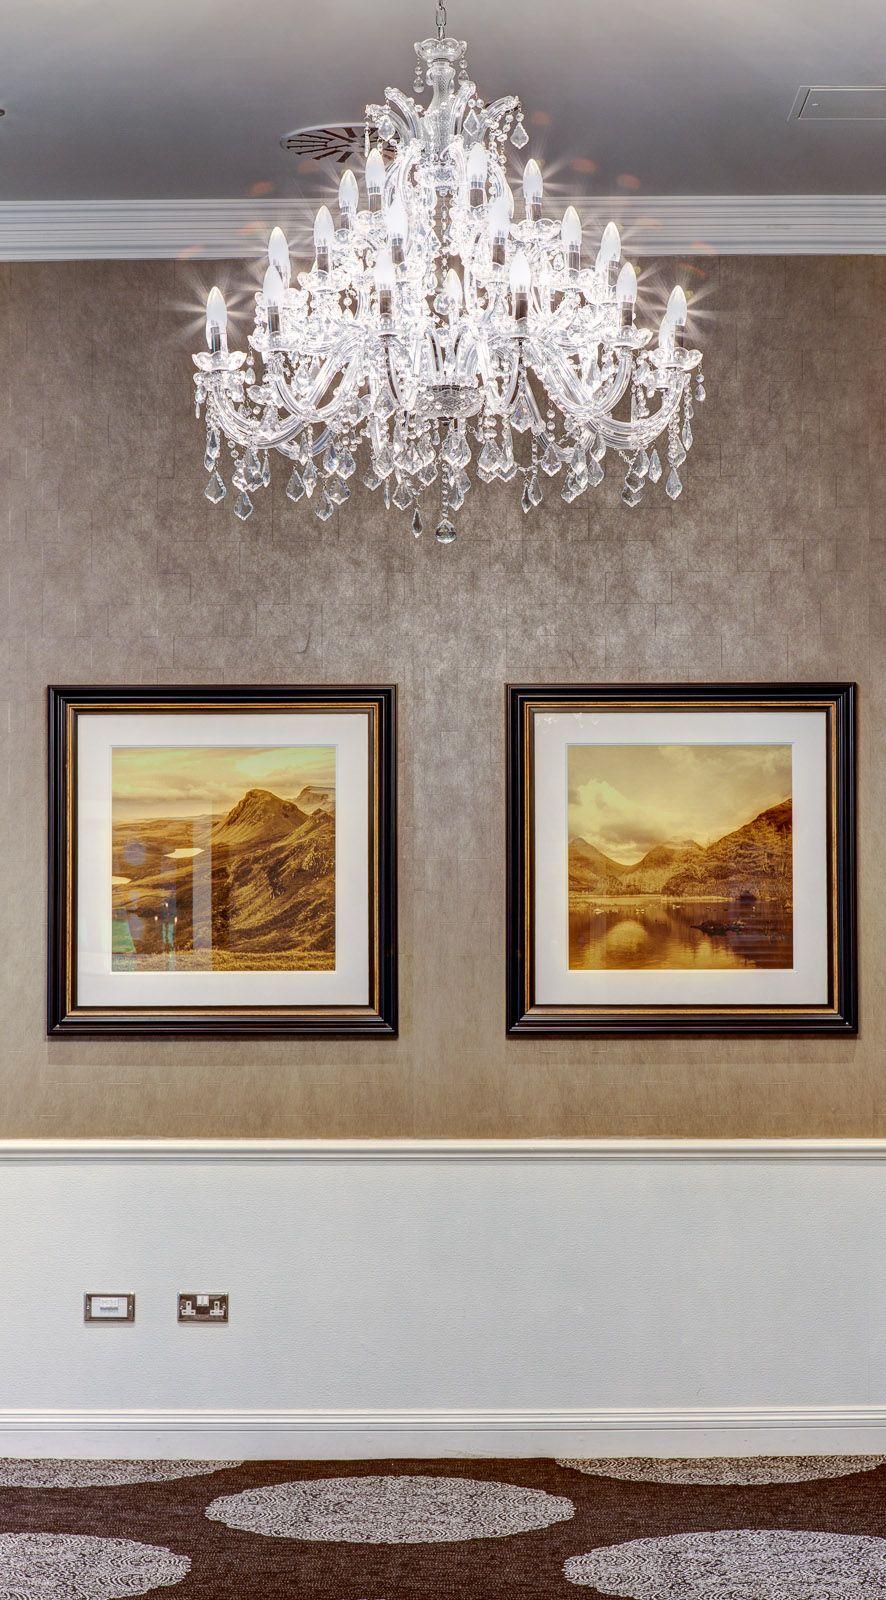 #chandelier #kingsmills #reception #foyer #dining #event #inverness #scotland #highlands #awardwinning #hotel